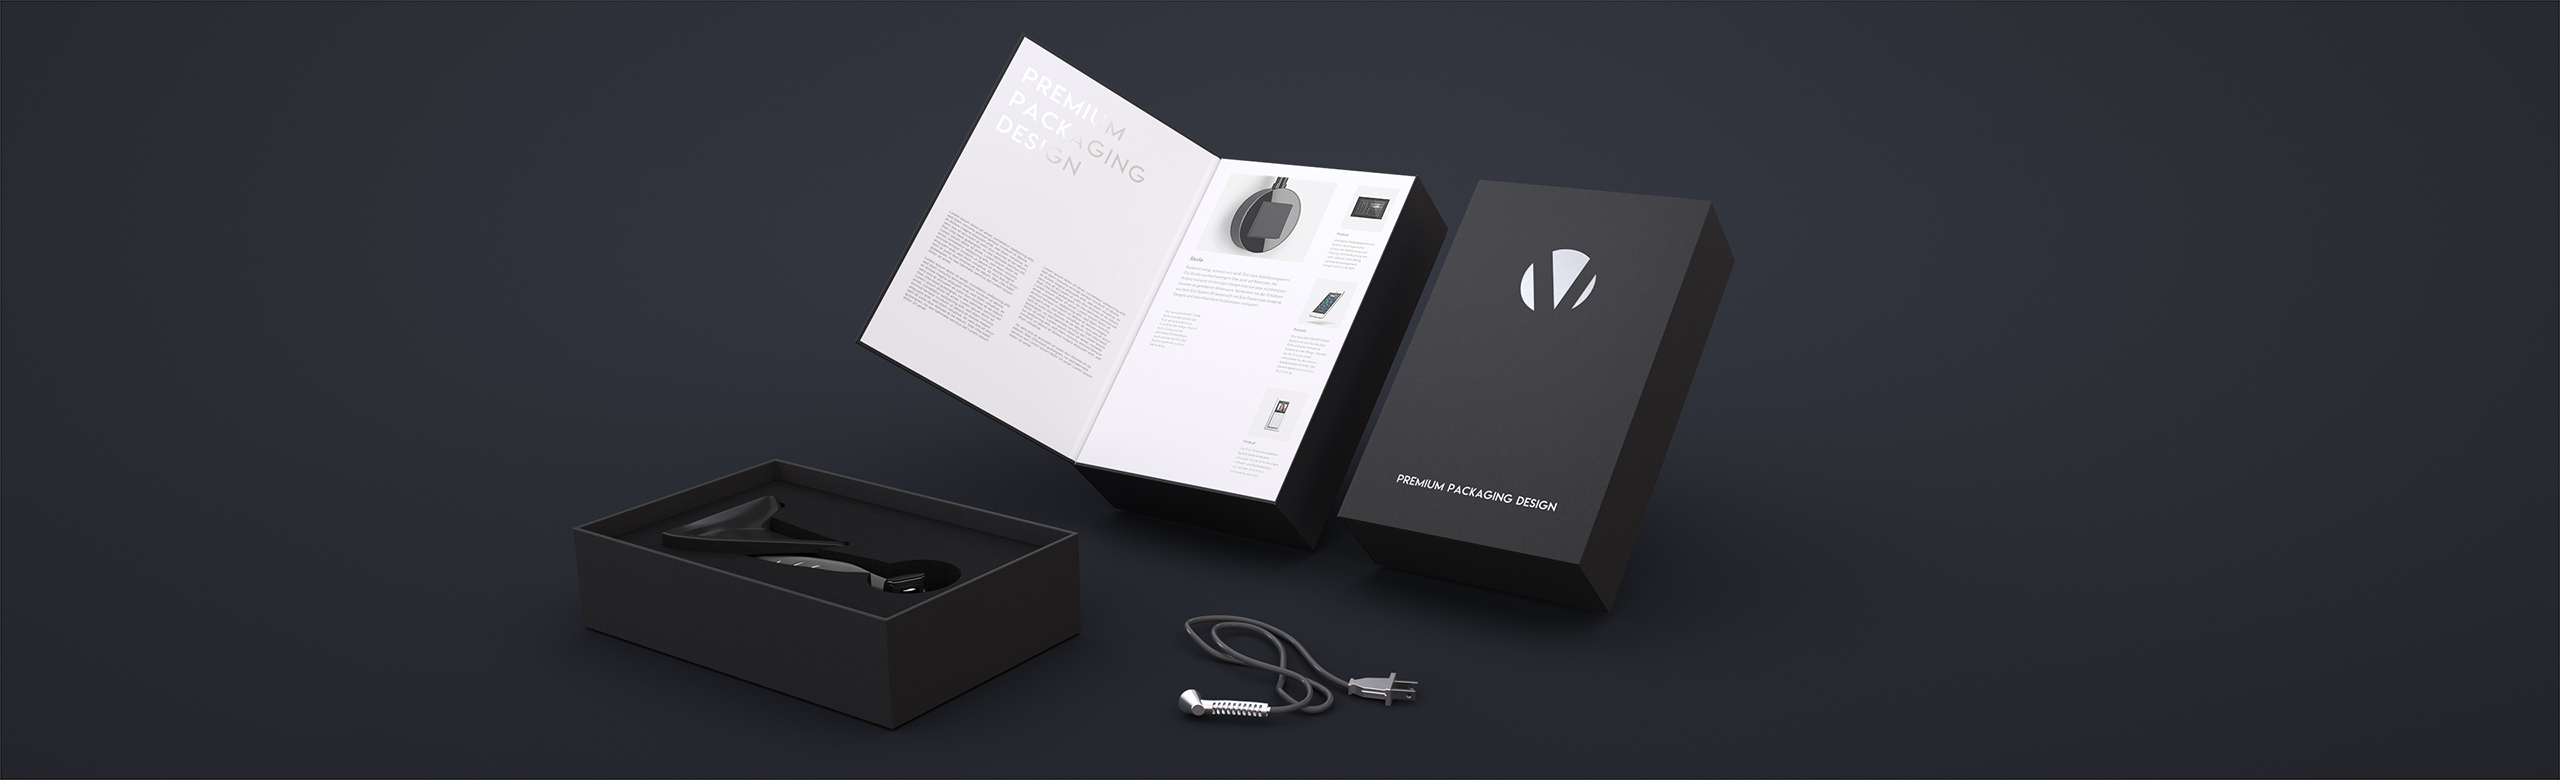 Design Verpackungen   Hochwertige Verpackungen Nach Mass Guddenberg